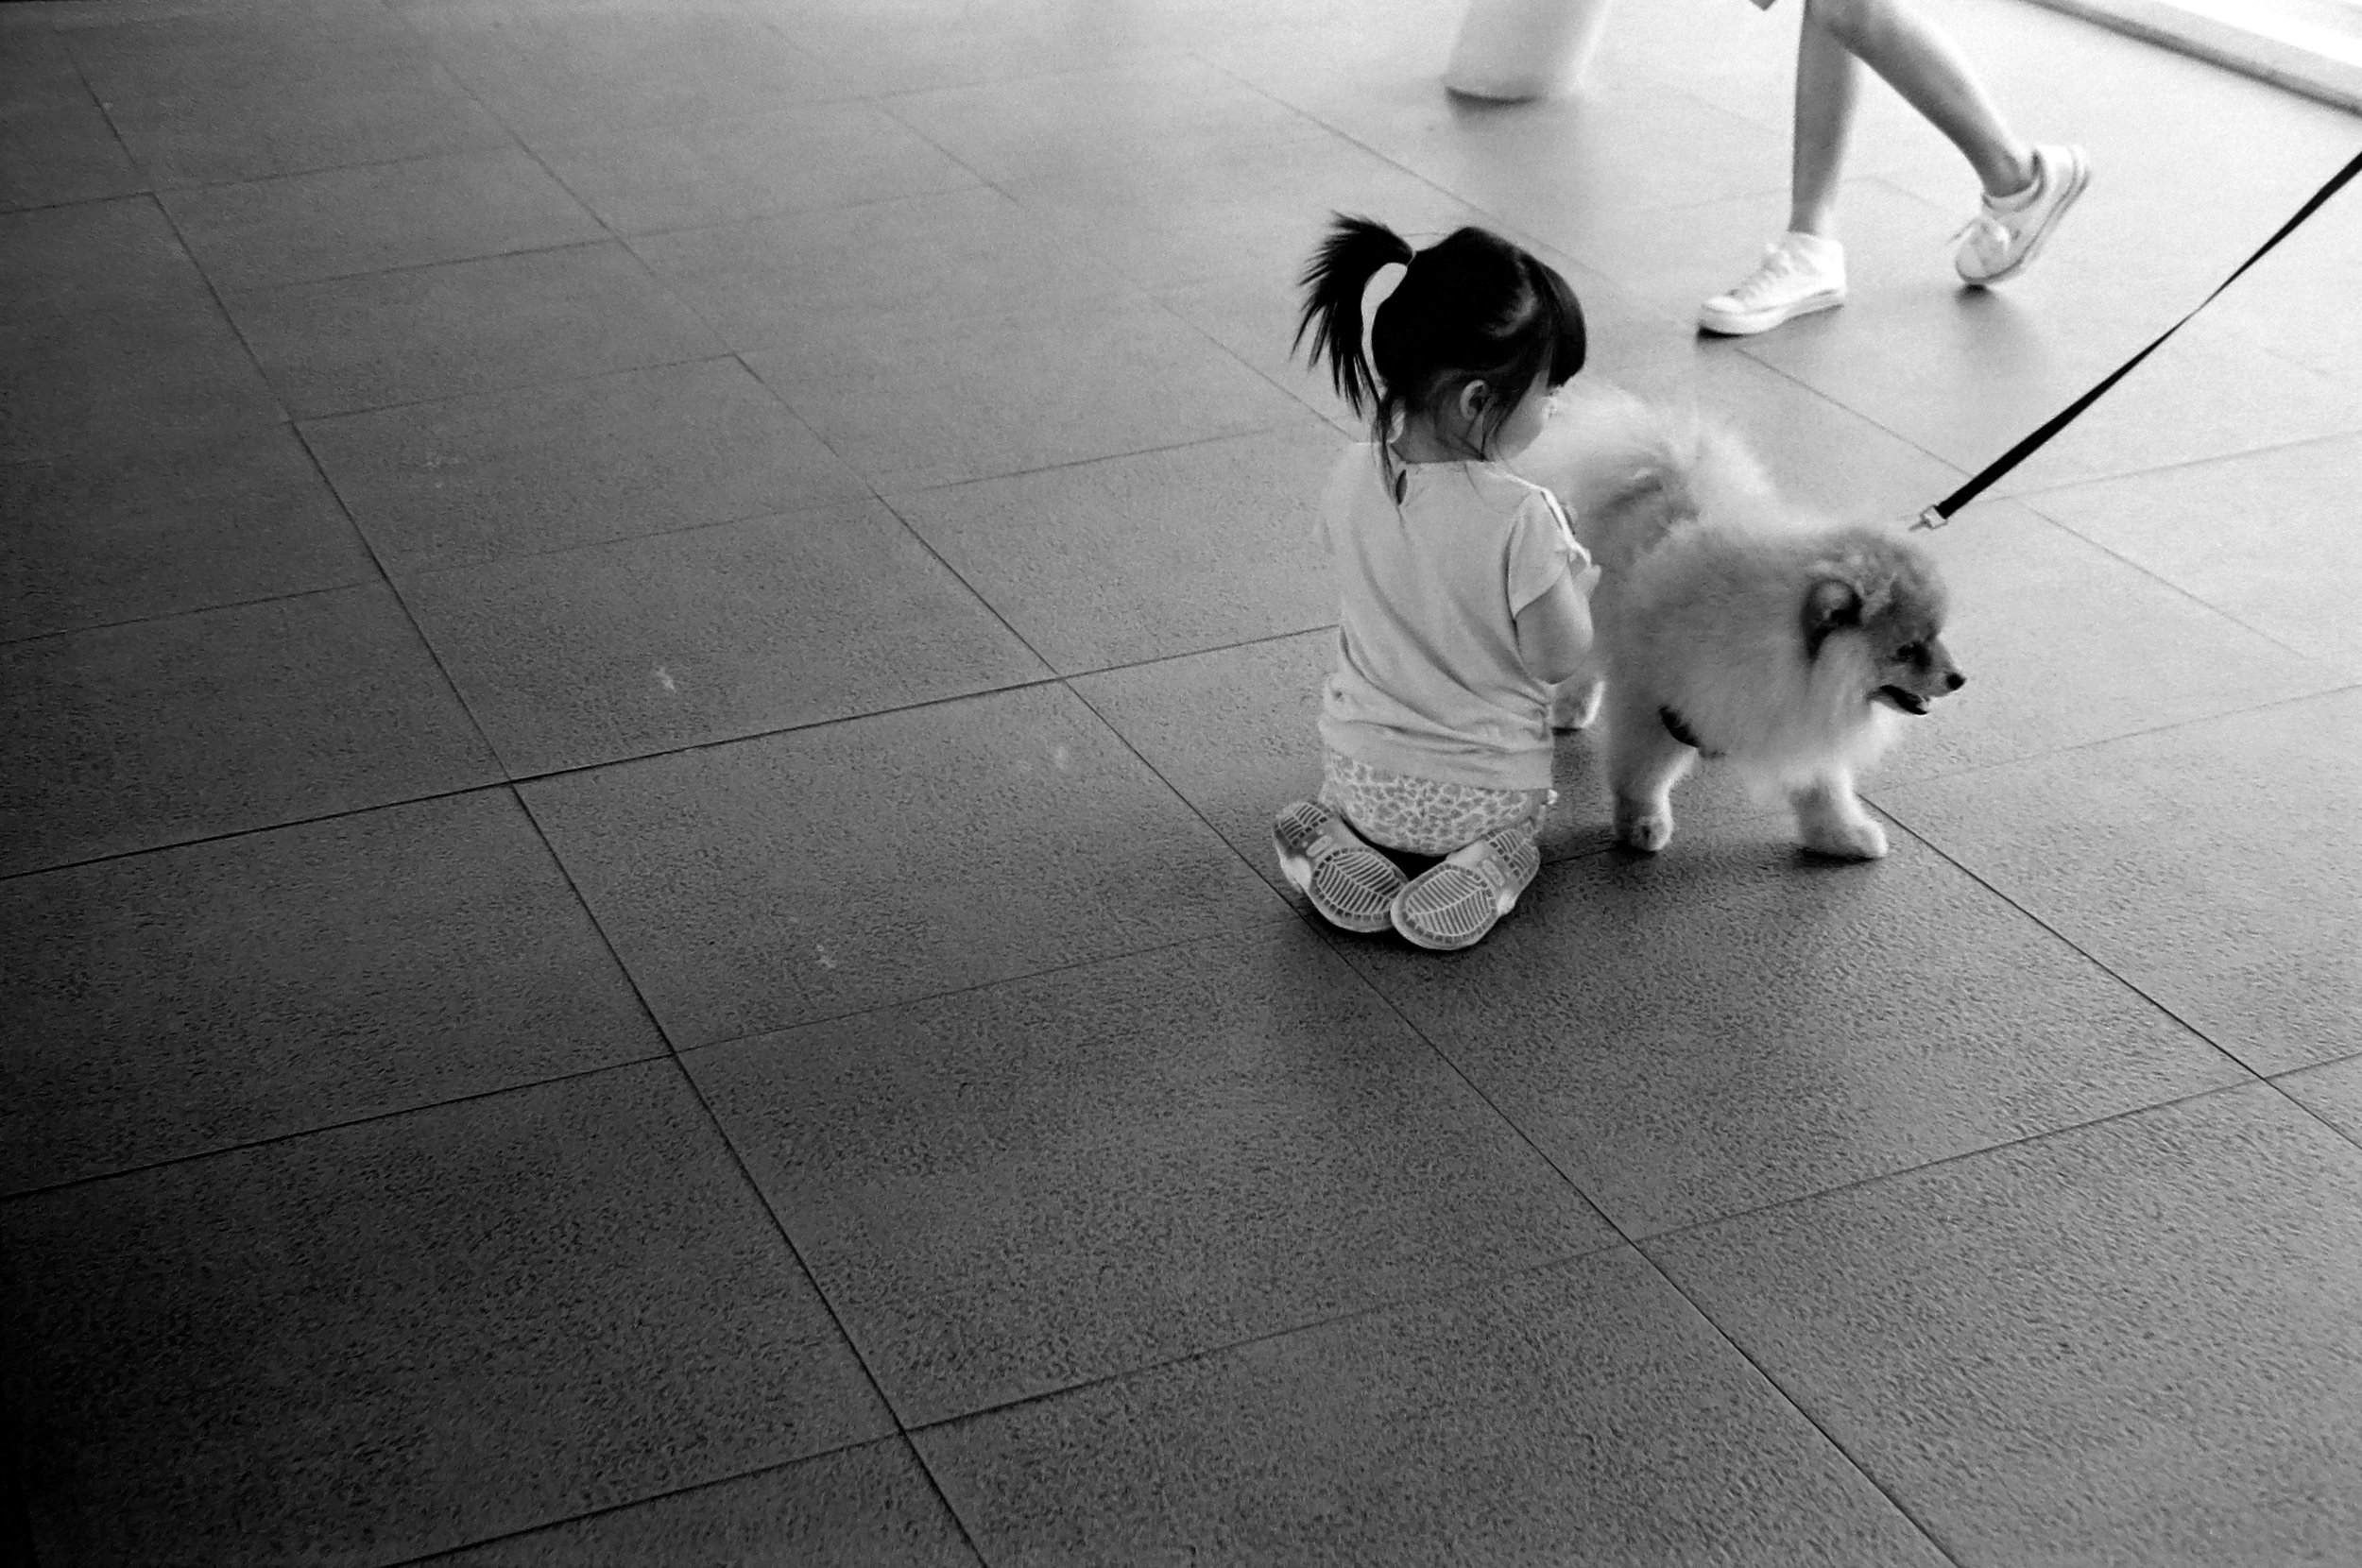 chromacomaphoto street photography bangkok thailand film tri x summicron rigid 50 leica m4 black and white (5).JPG